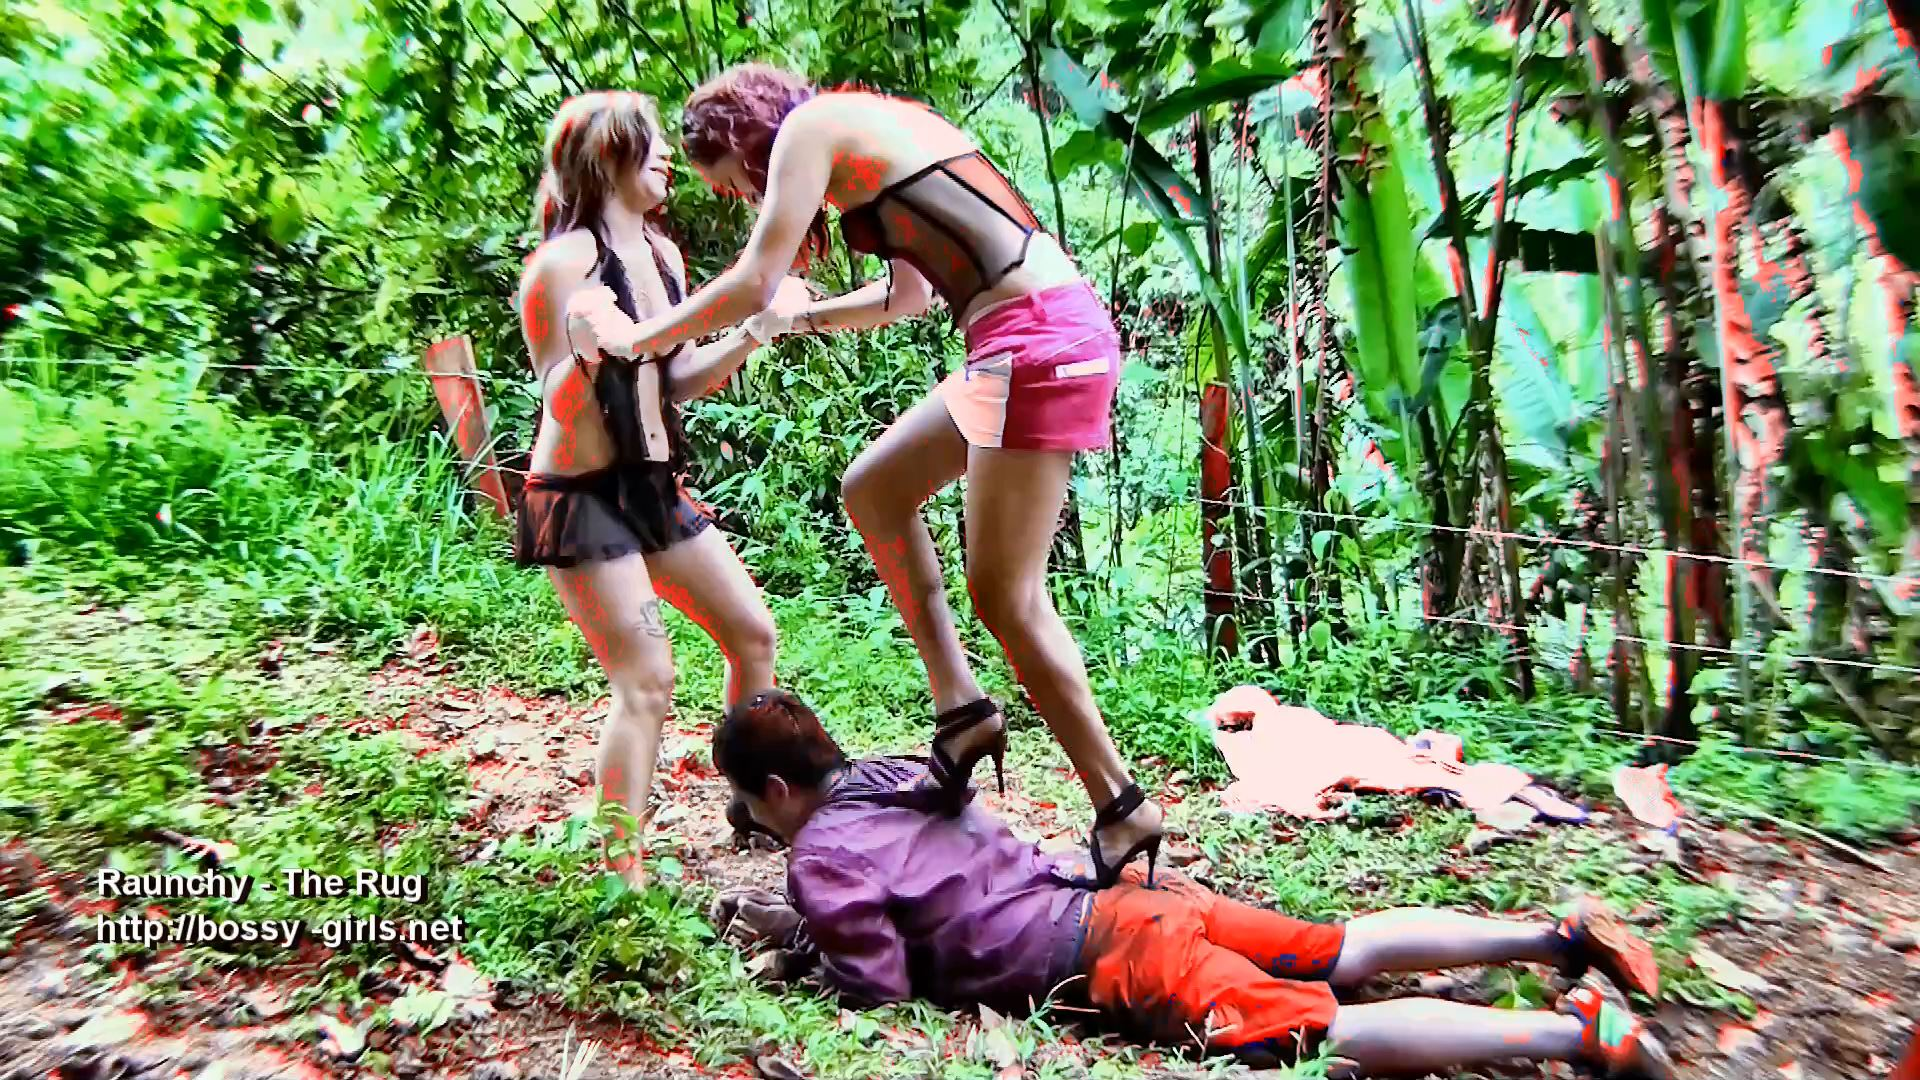 Jane Guerrero, Ms. Liz, slave doggie In Scene: RAUNCHY 03 The Rug - BOSSY-GIRLS - FULL HD/1080p/MP4